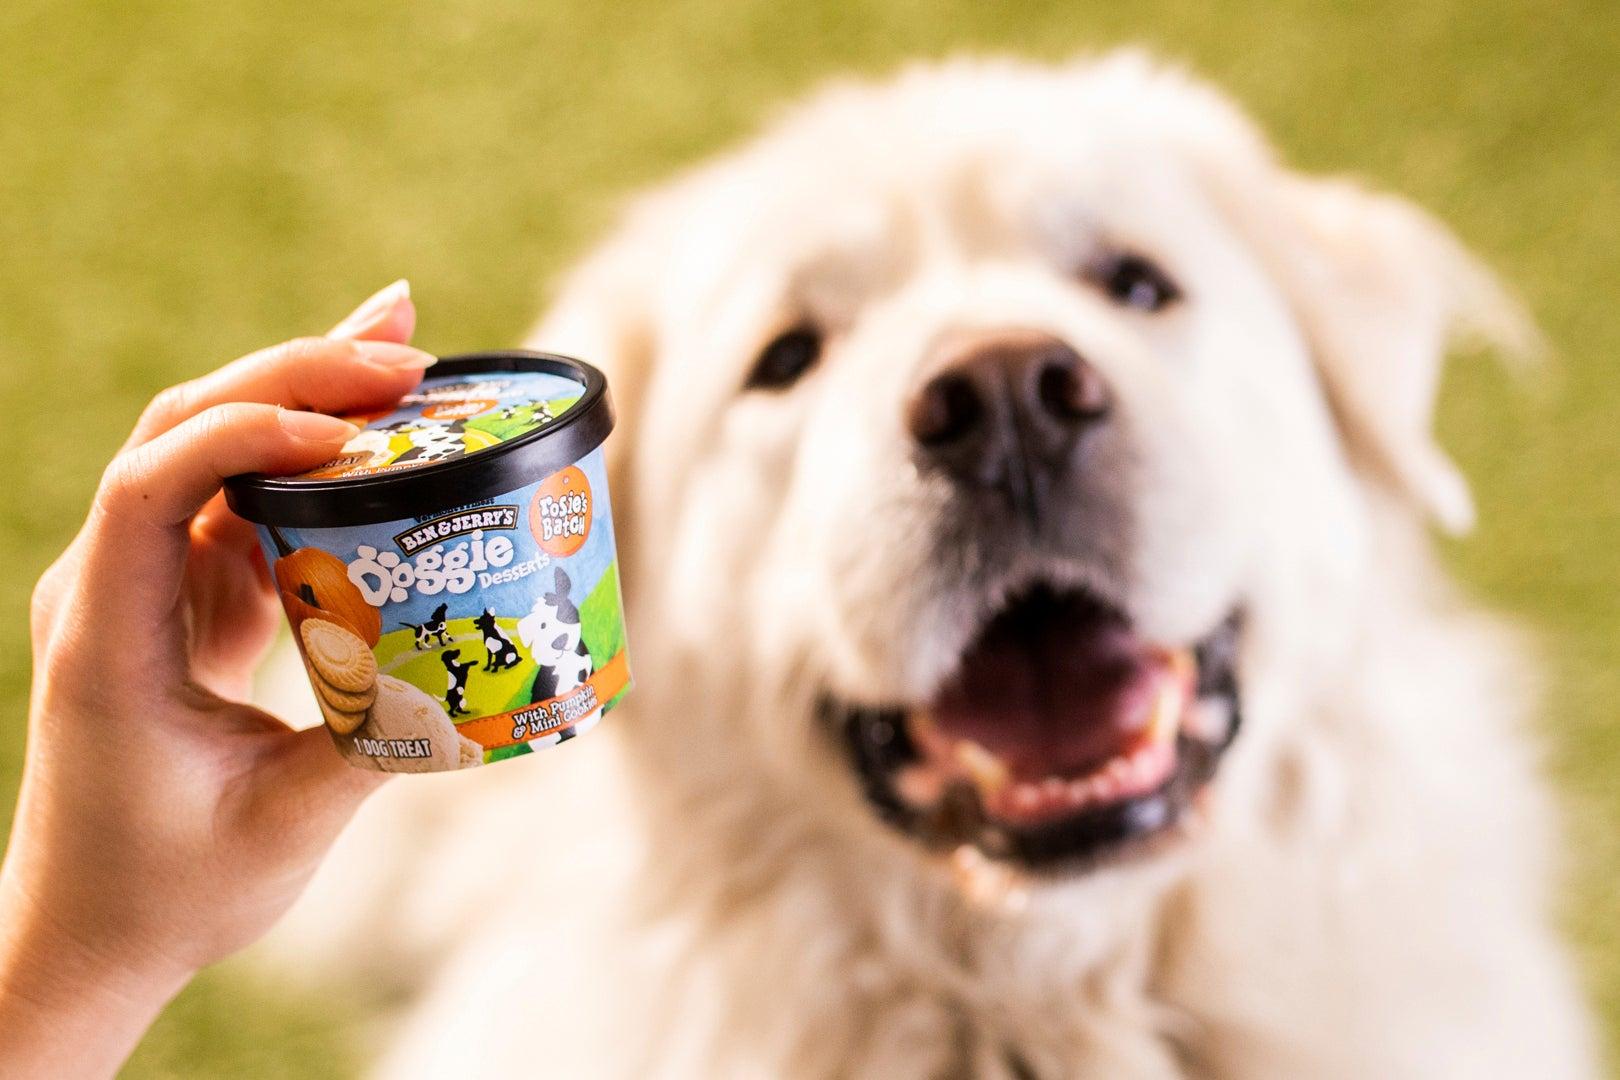 Doggie desserts: Ben & Jerry's enters the pet food business